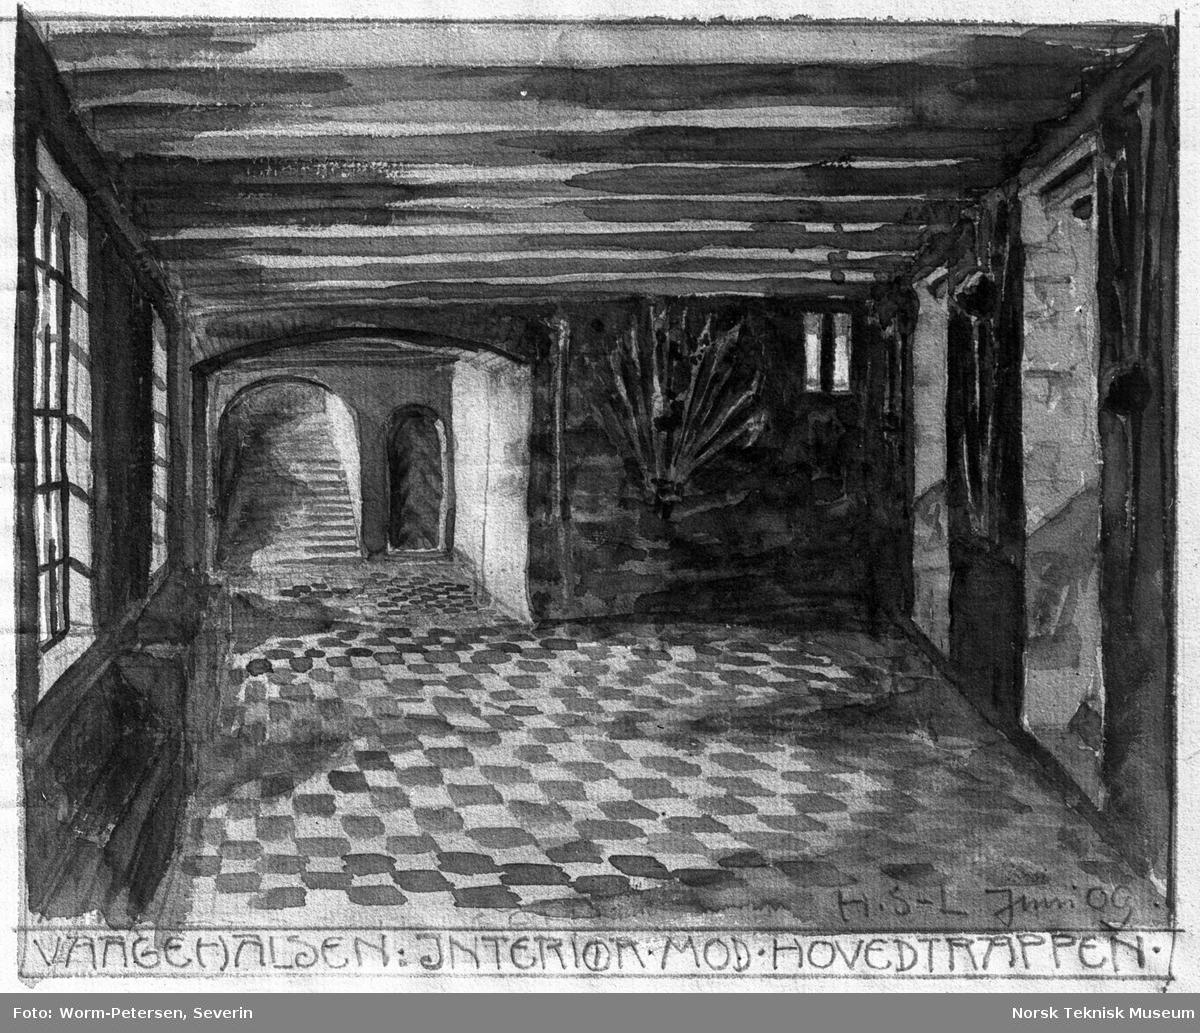 Akvarell, Akerhus festning; Vågehalsen, interiør mot hovedtrappen